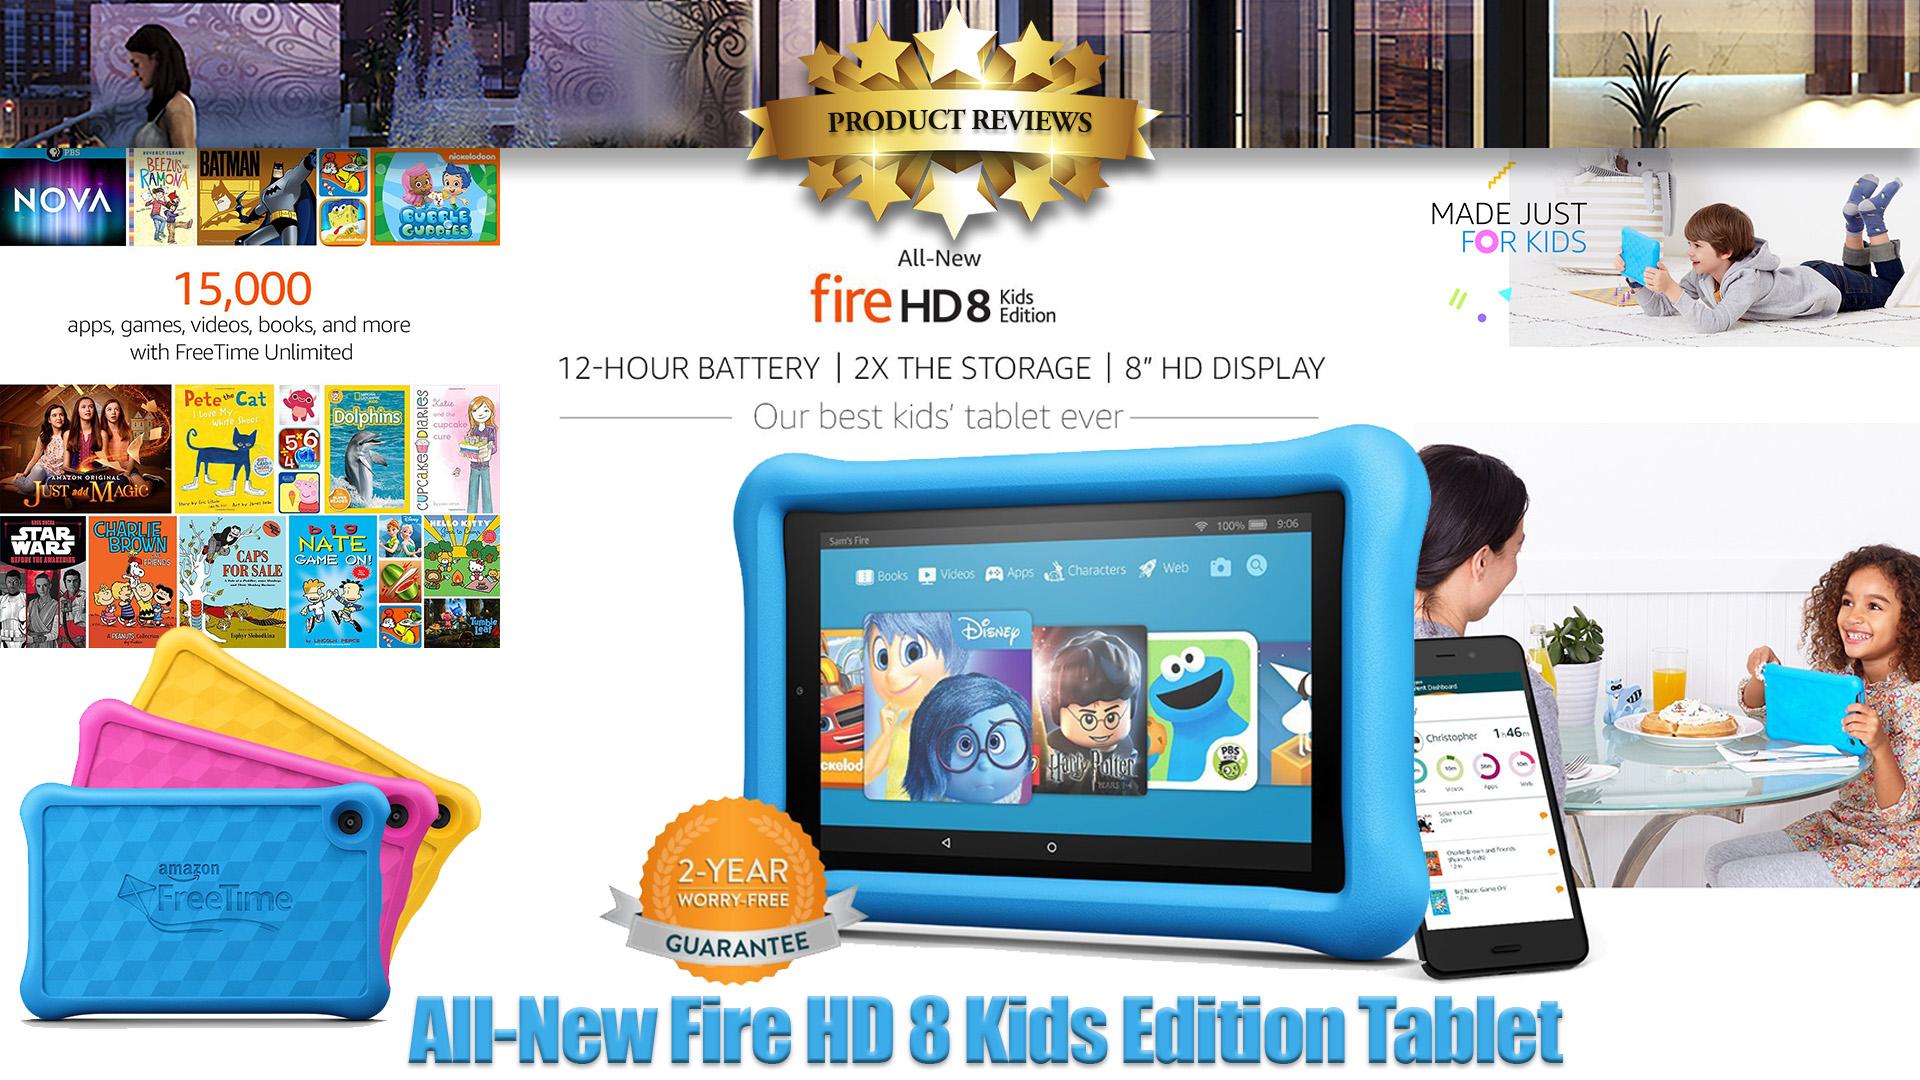 "All-New Fire HD 8 Kids Edition Tablet | 8"" HD Display"